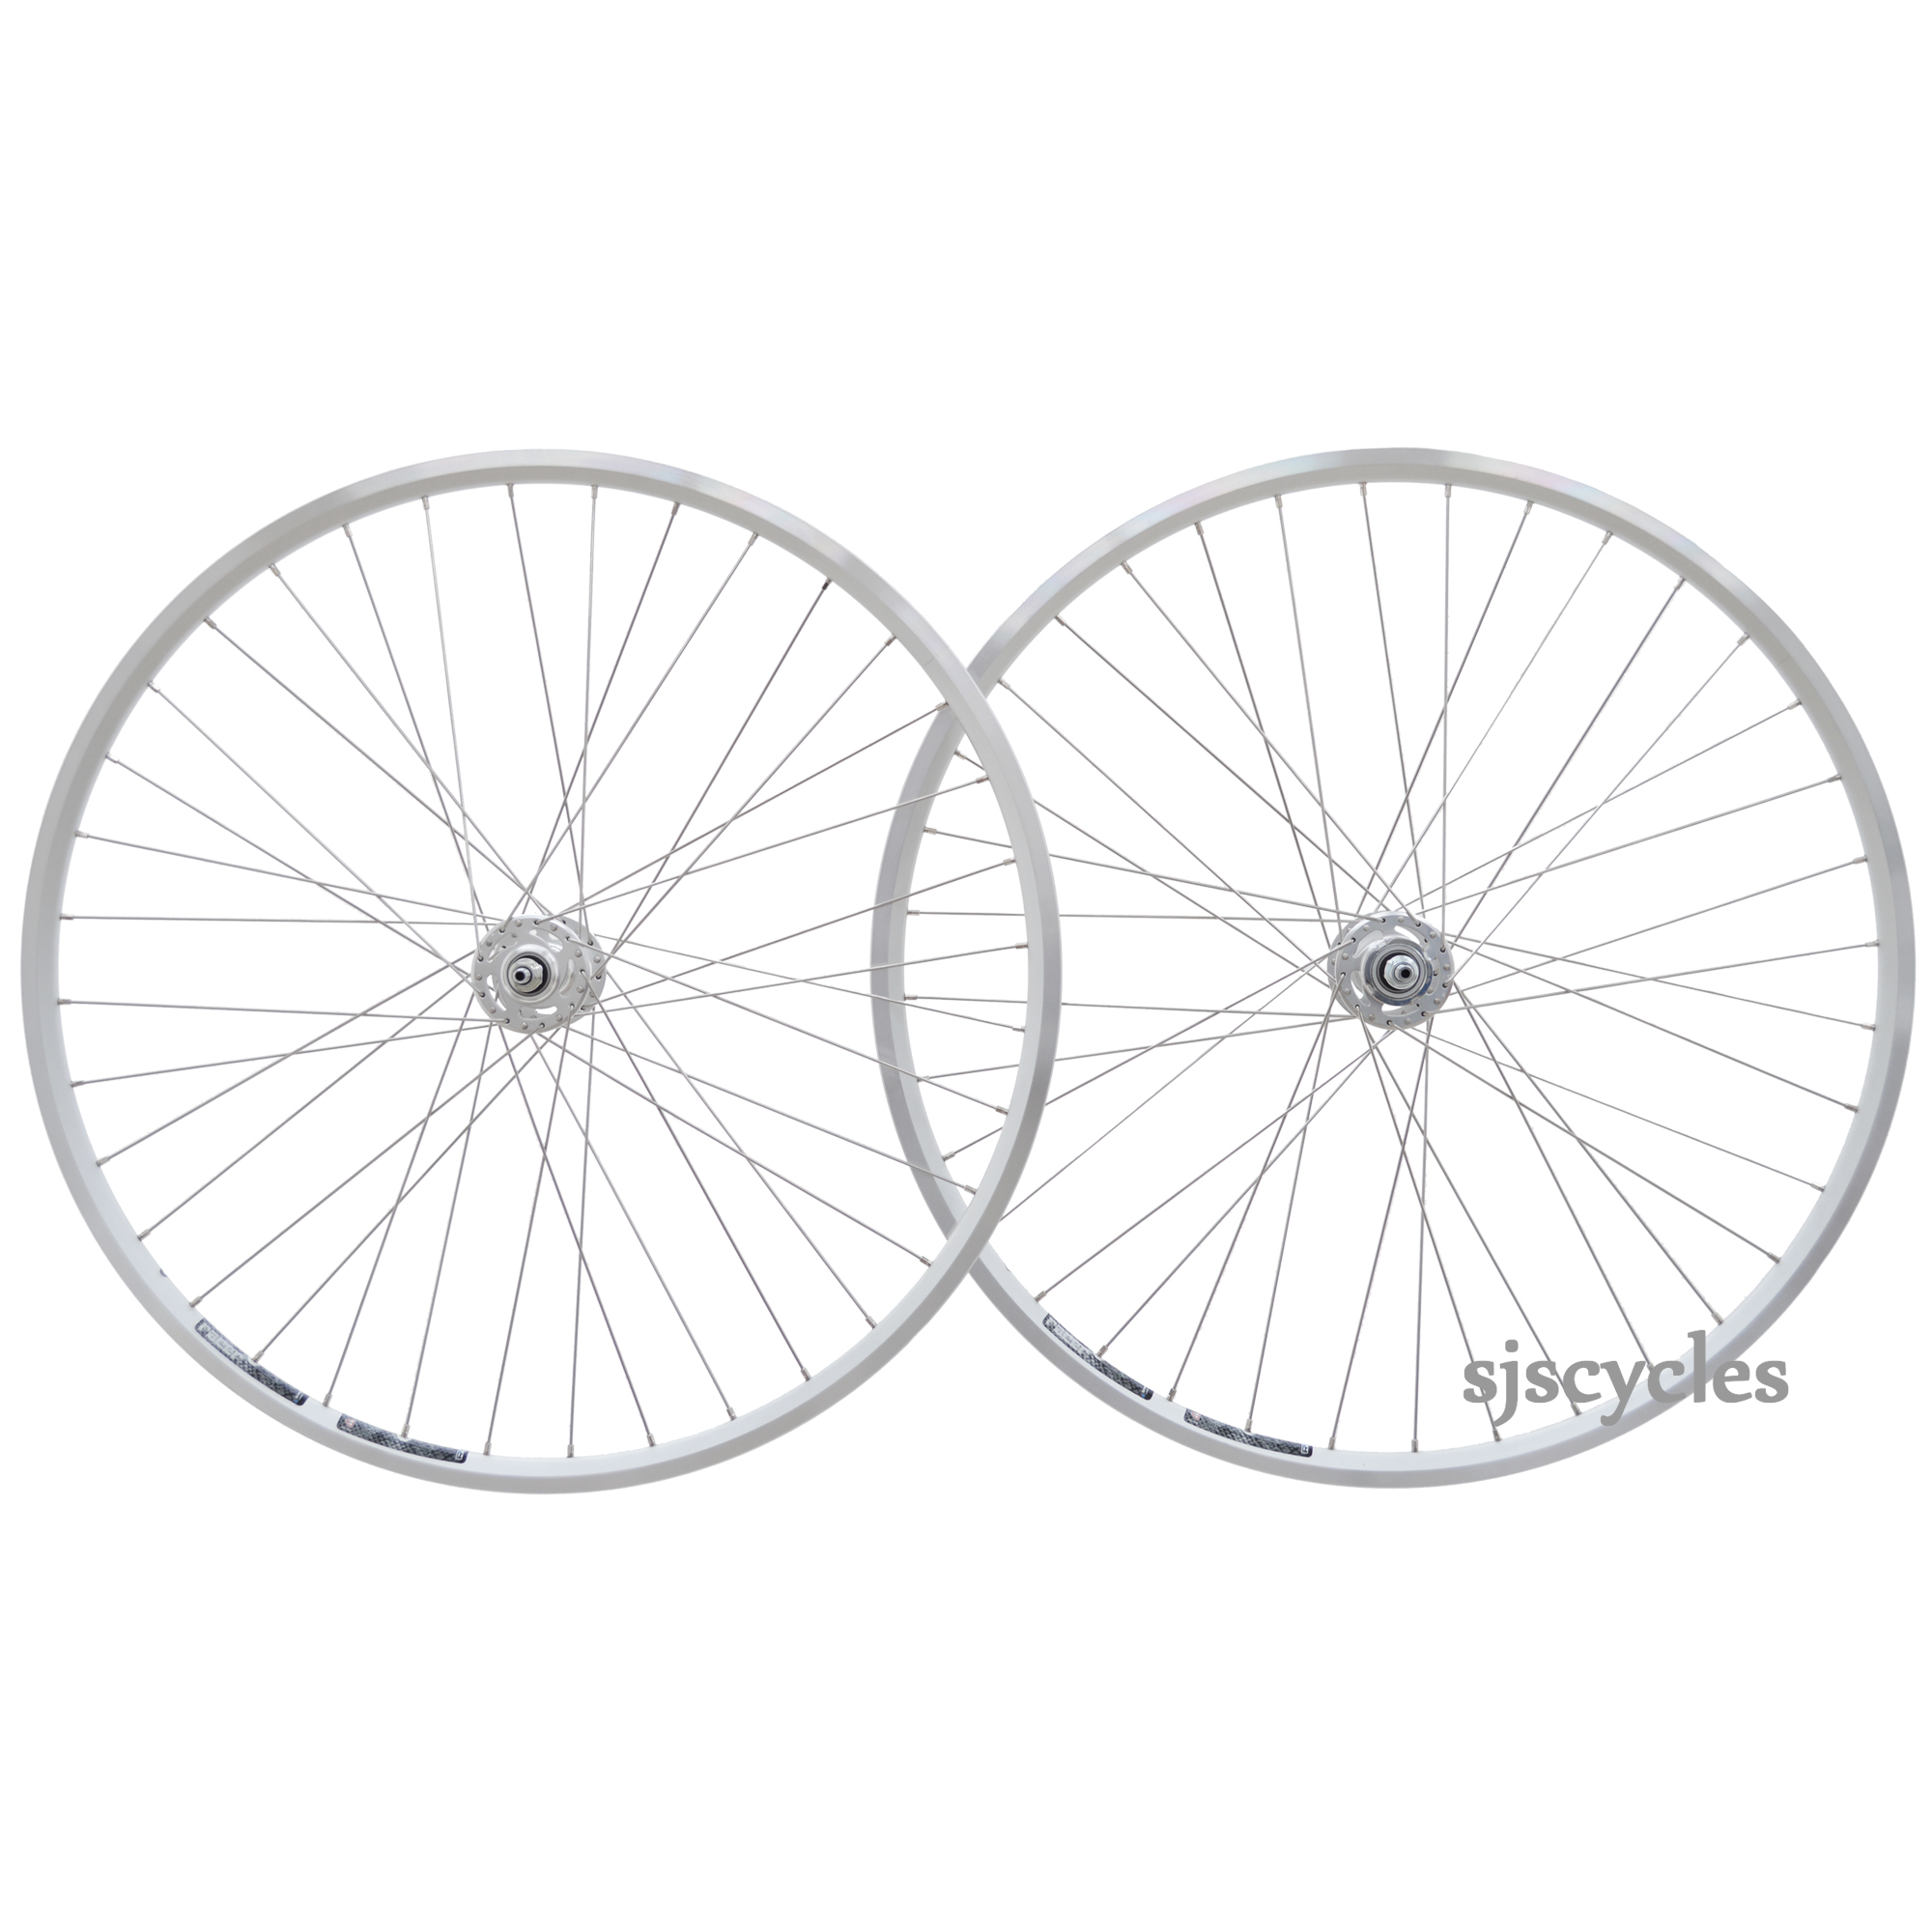 Color : Silver, Size : 700c LSRRYD Super Light Road Bike Rim 29 Inch 700c Bicycle Wheelset Rim Brake Quick Release Sealed Bearings Hubs 7-11 Speed Cassette Freewheel 23-48C Tires 1770g